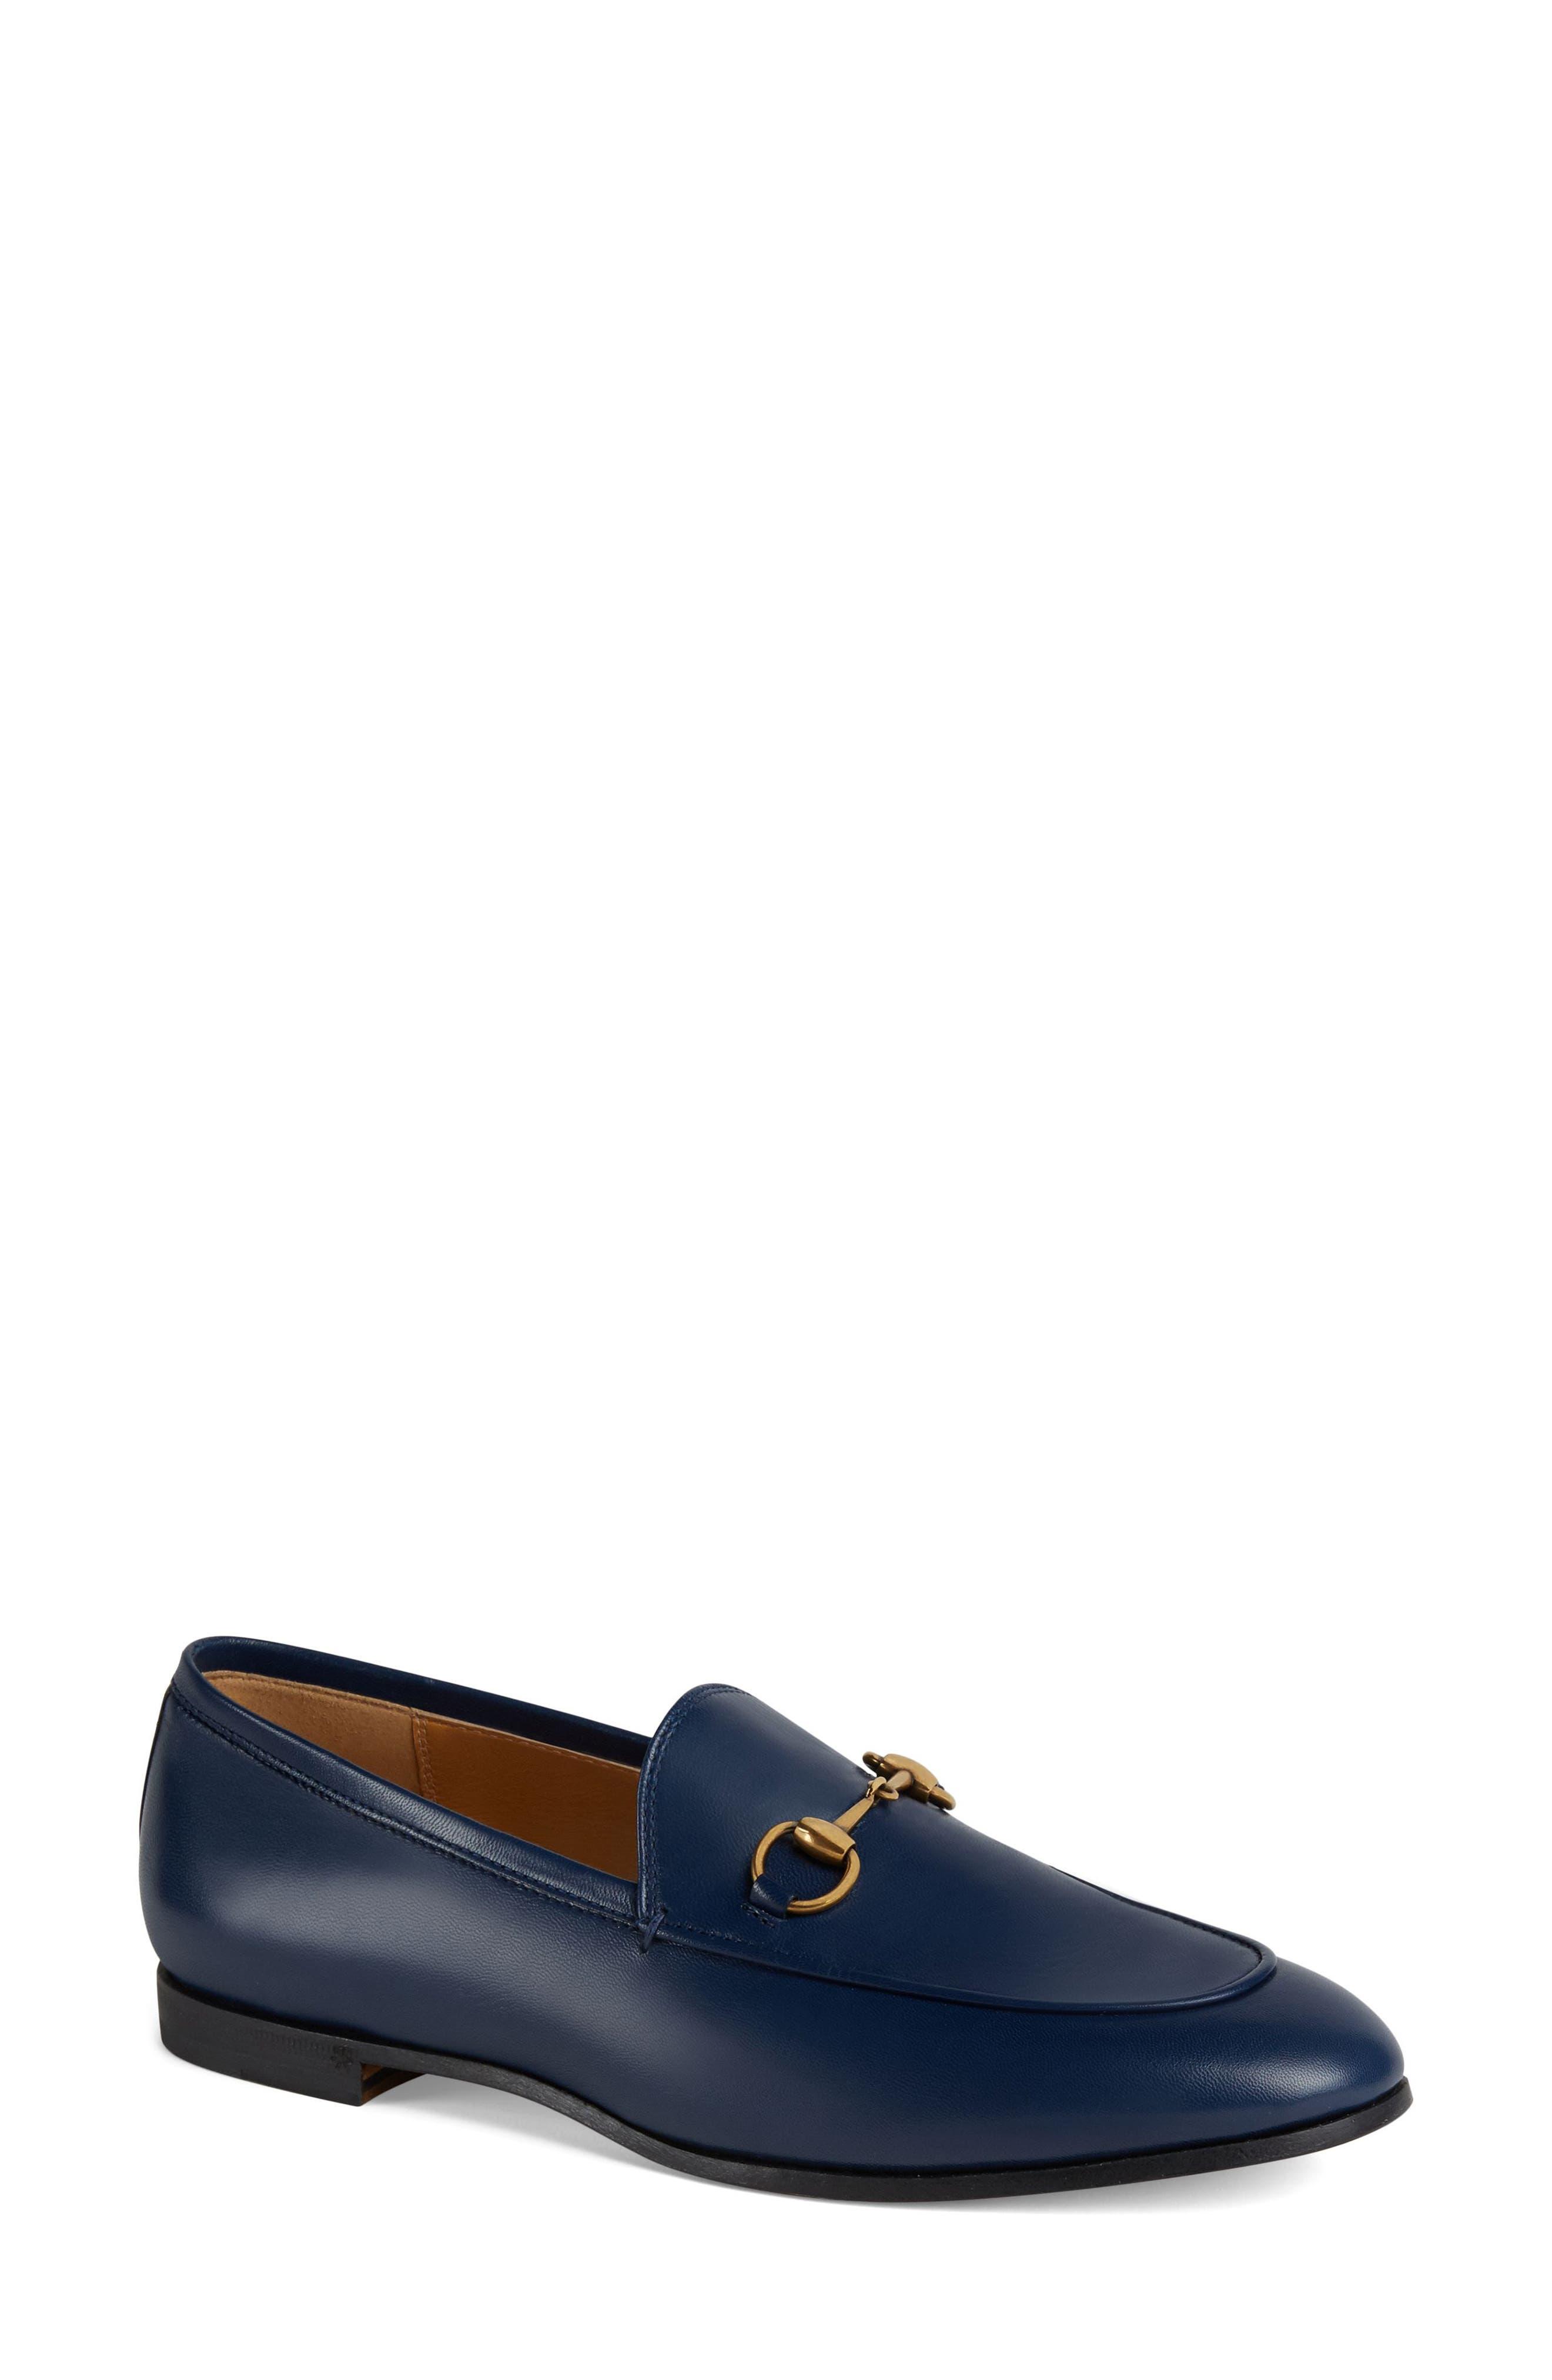 Gucci Women s Shoes 3c08285f998e